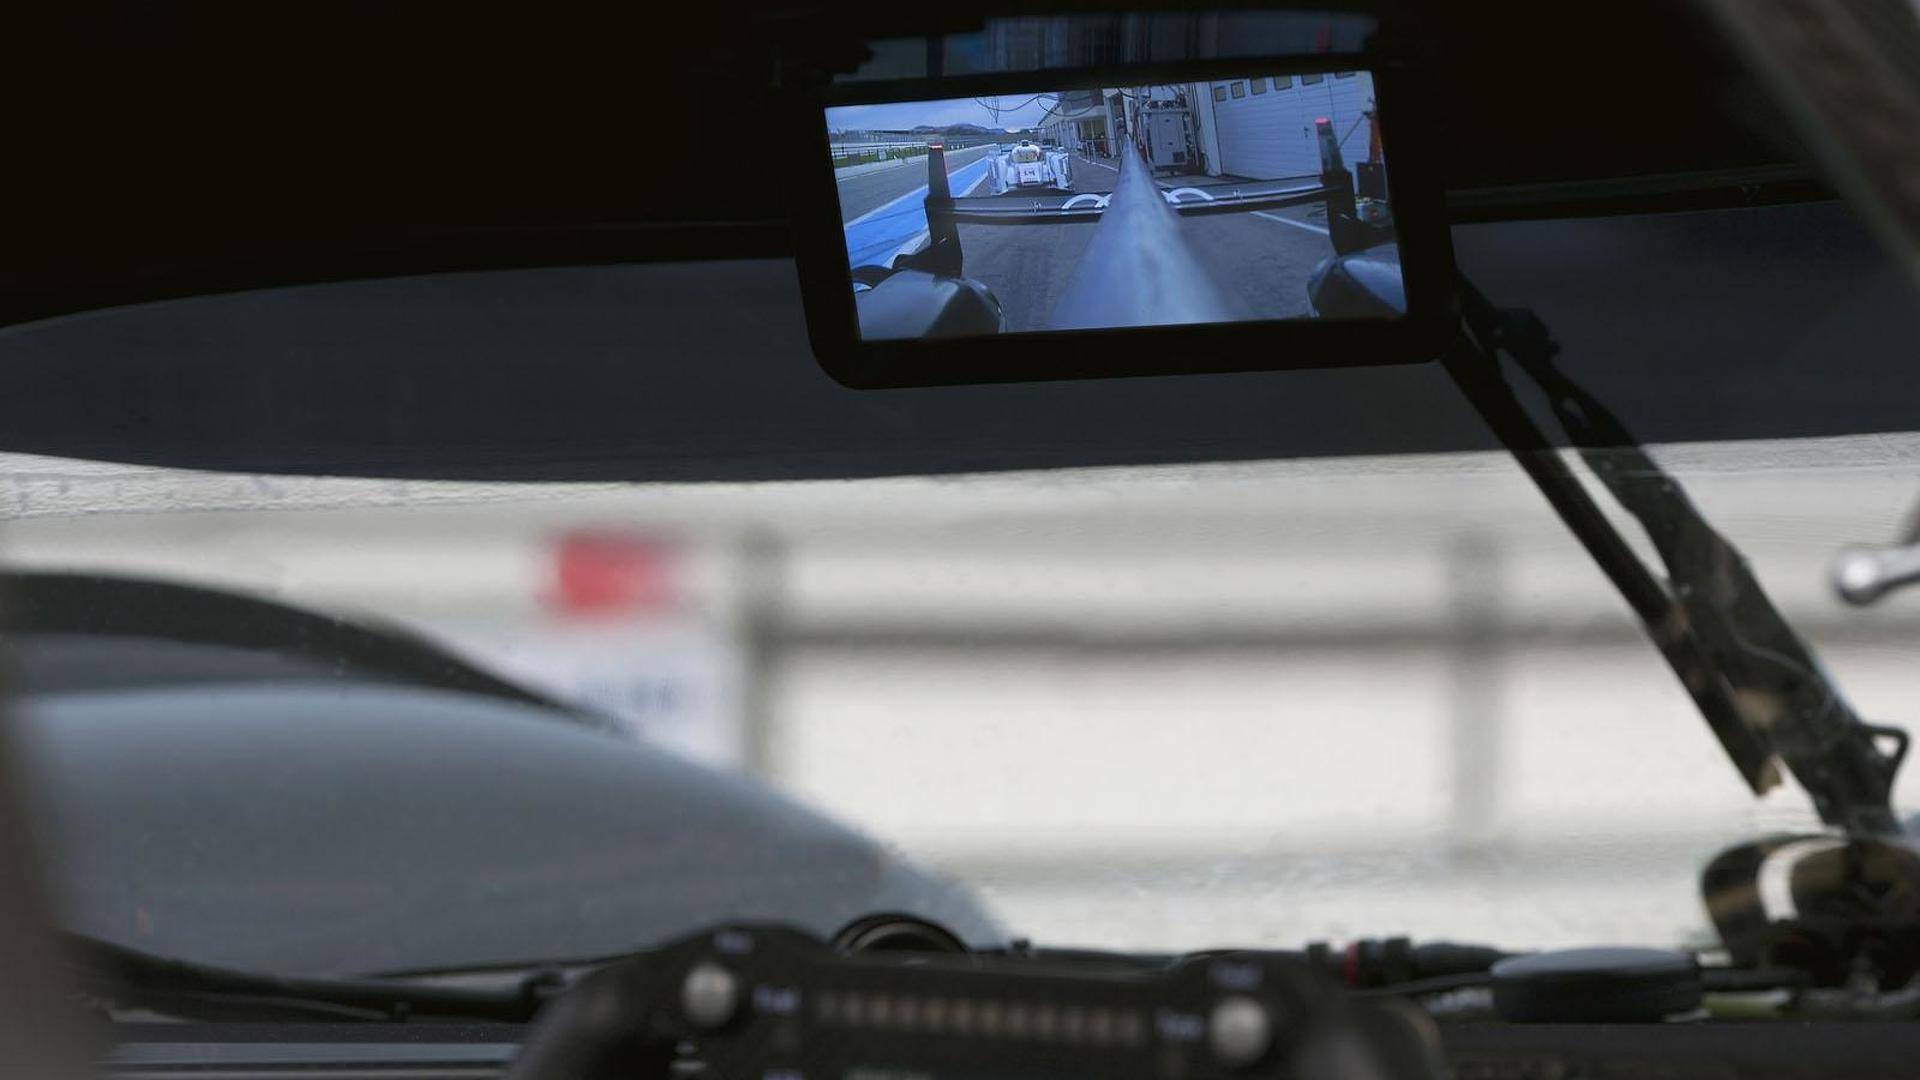 Audi shows off digital rear-view mirror